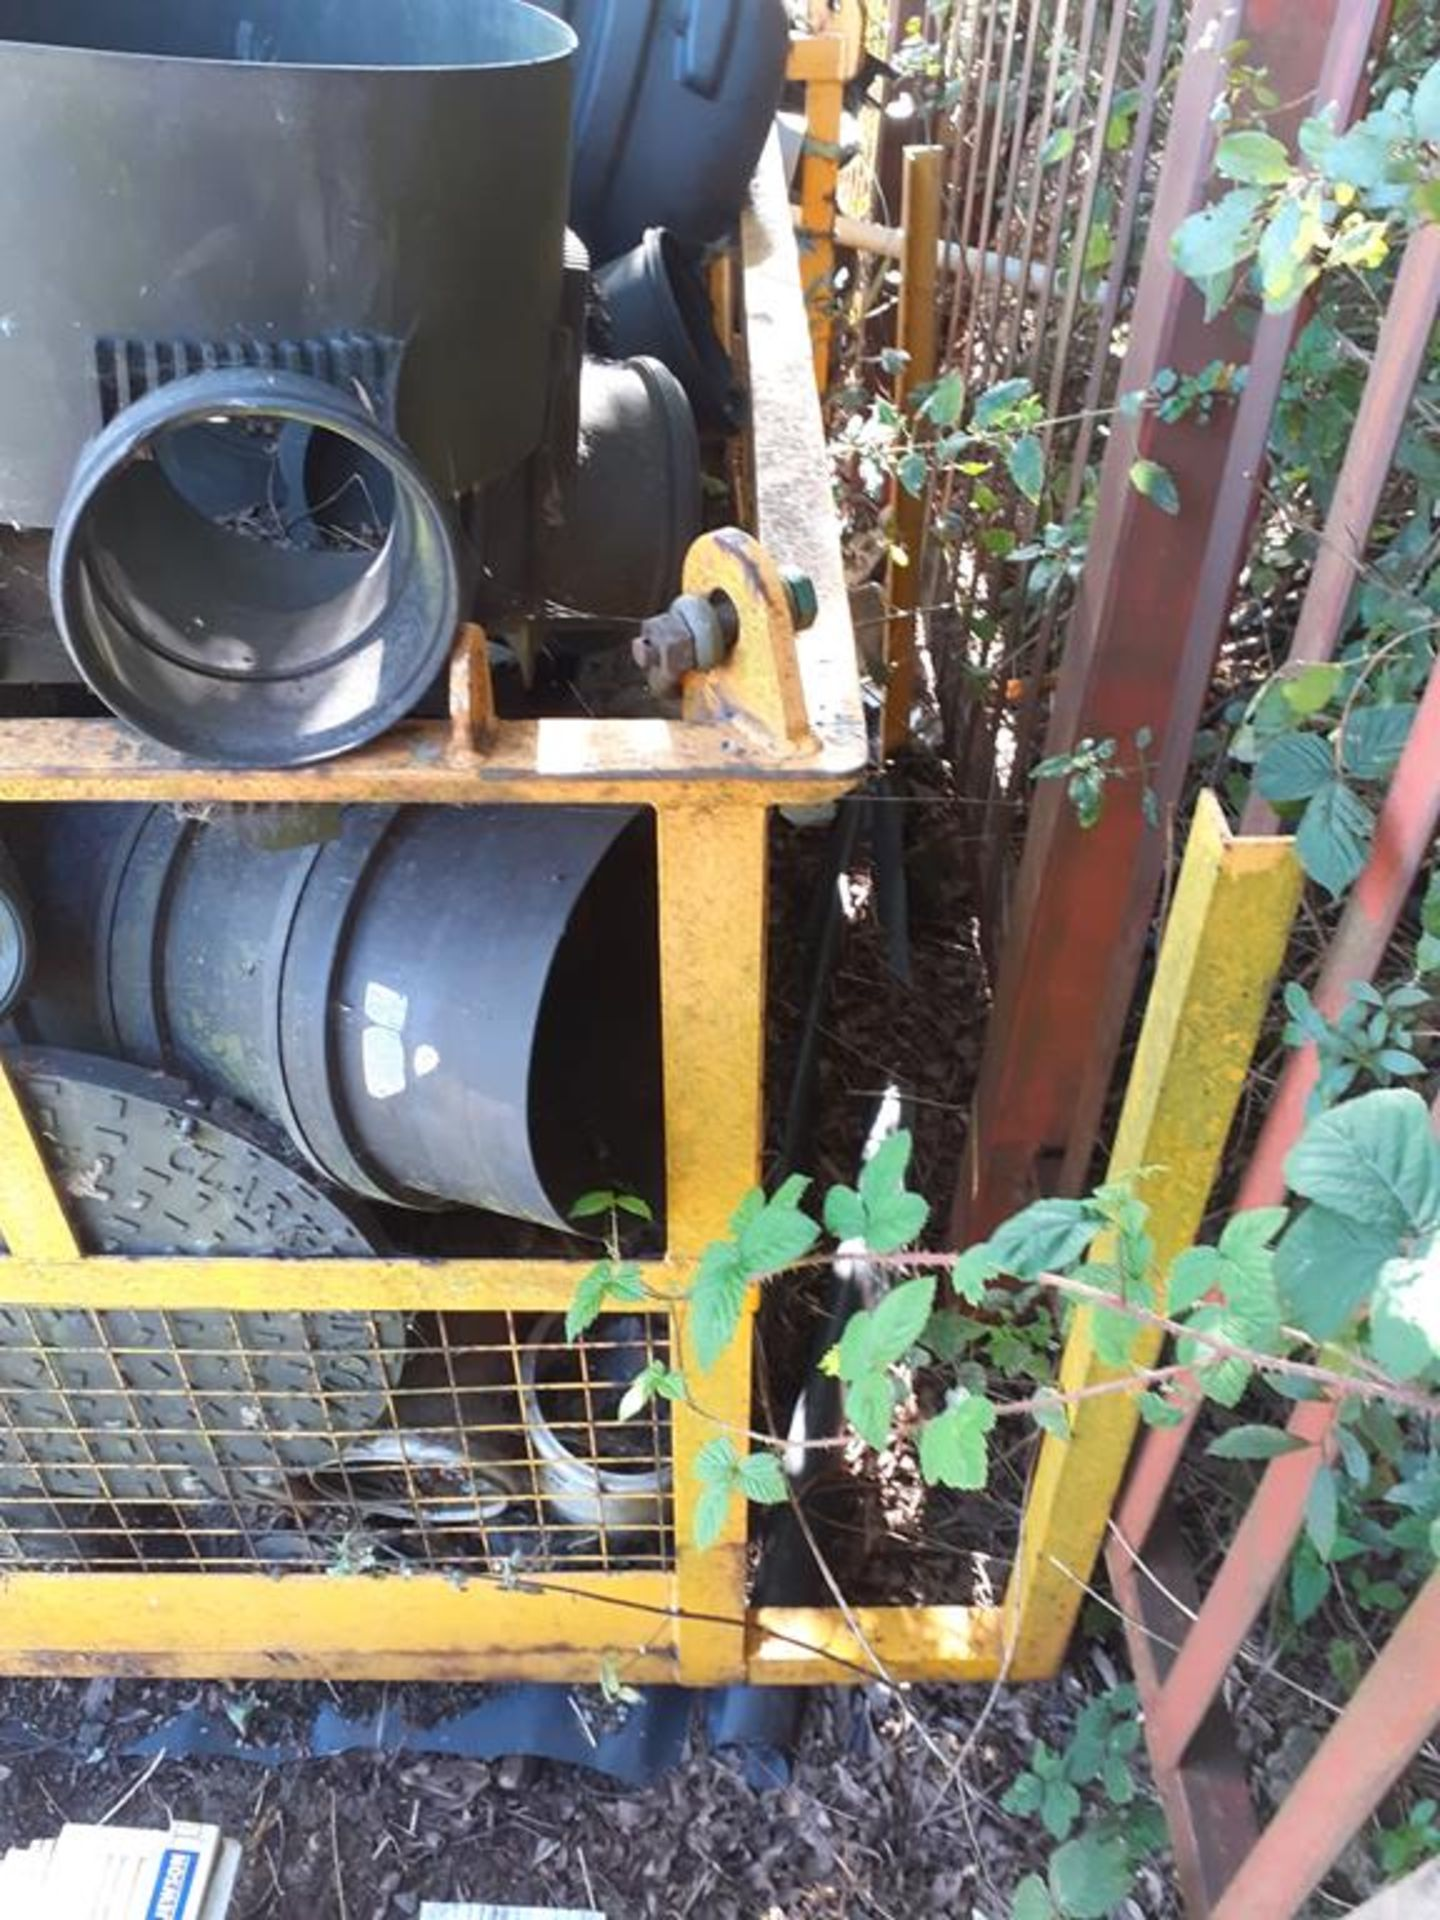 Forklift safety cage - Image 2 of 2